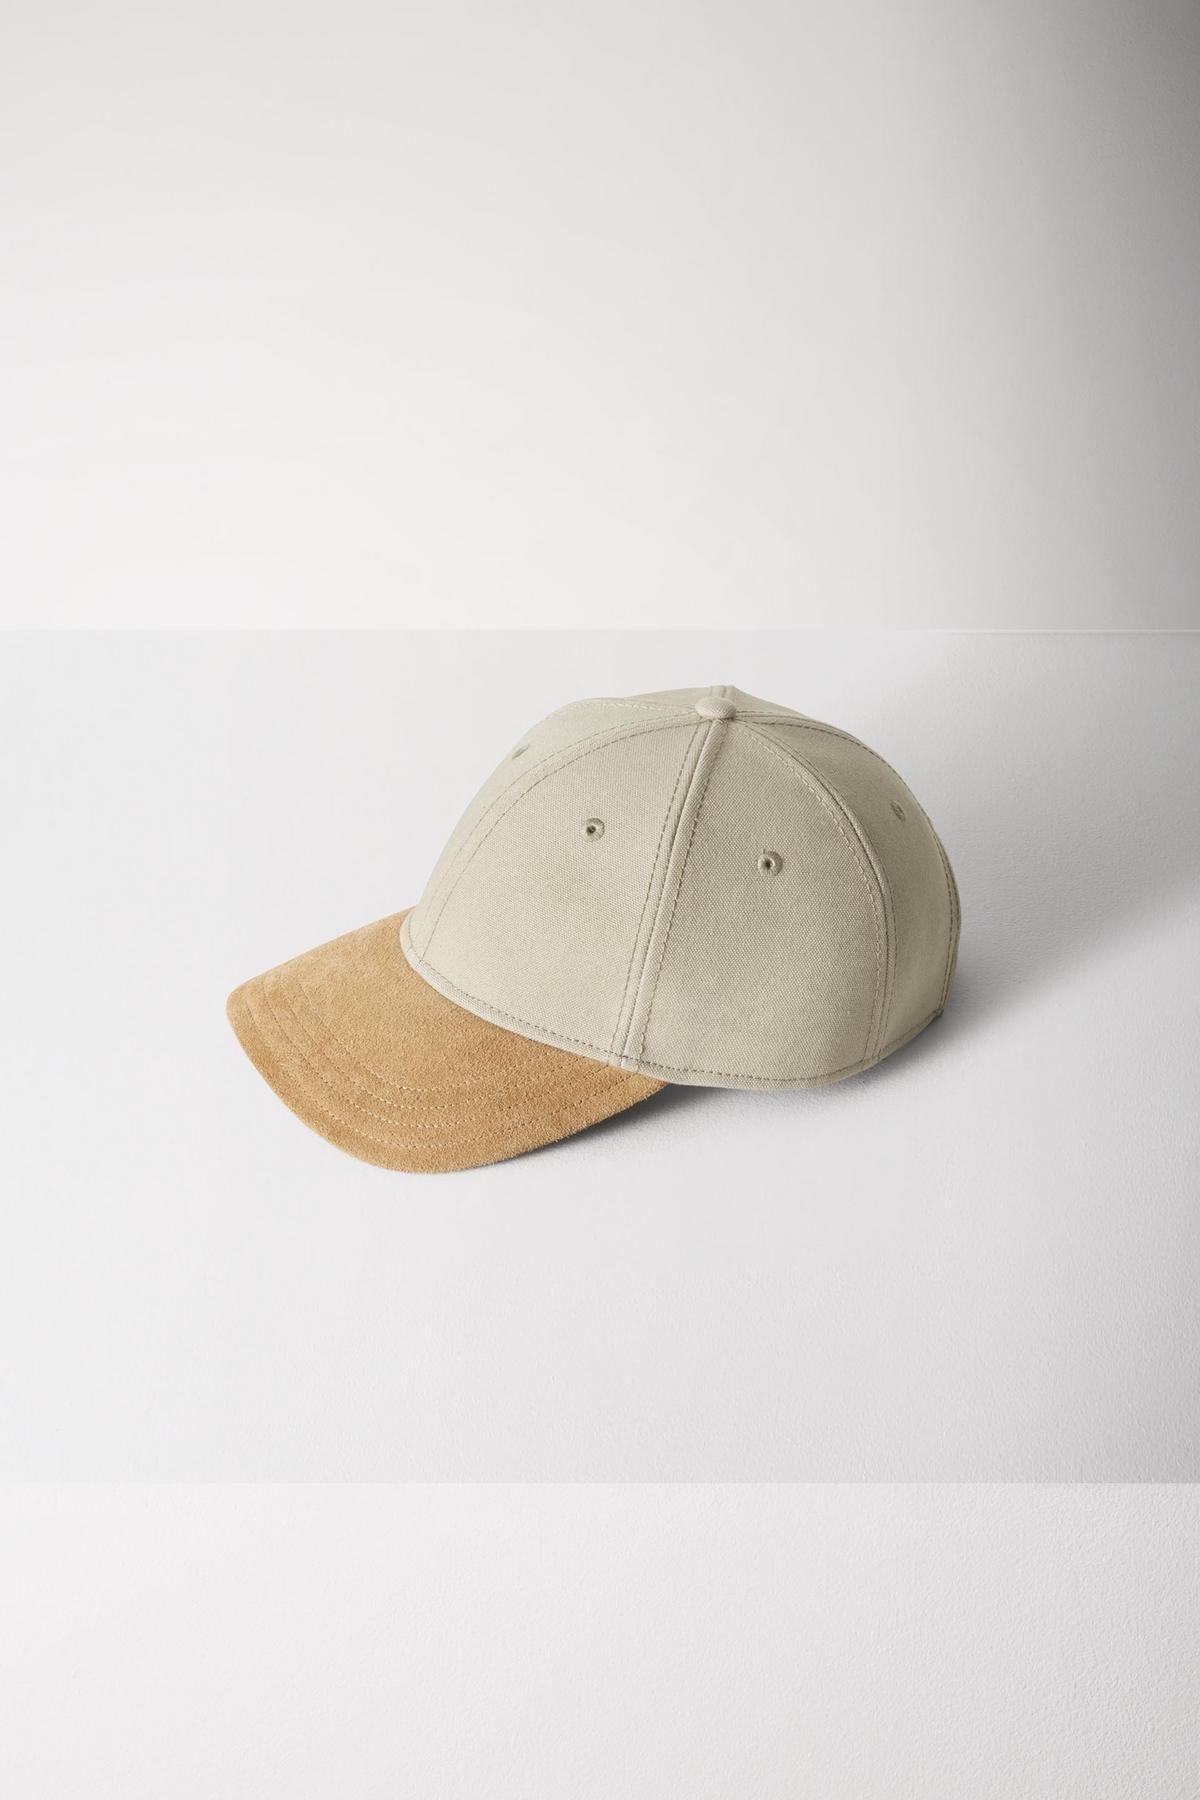 7ce9399f63cb SUEDE BRIM BASEBALL CAP   JAWNZ   Baseball cap, Hats, Rag, bone